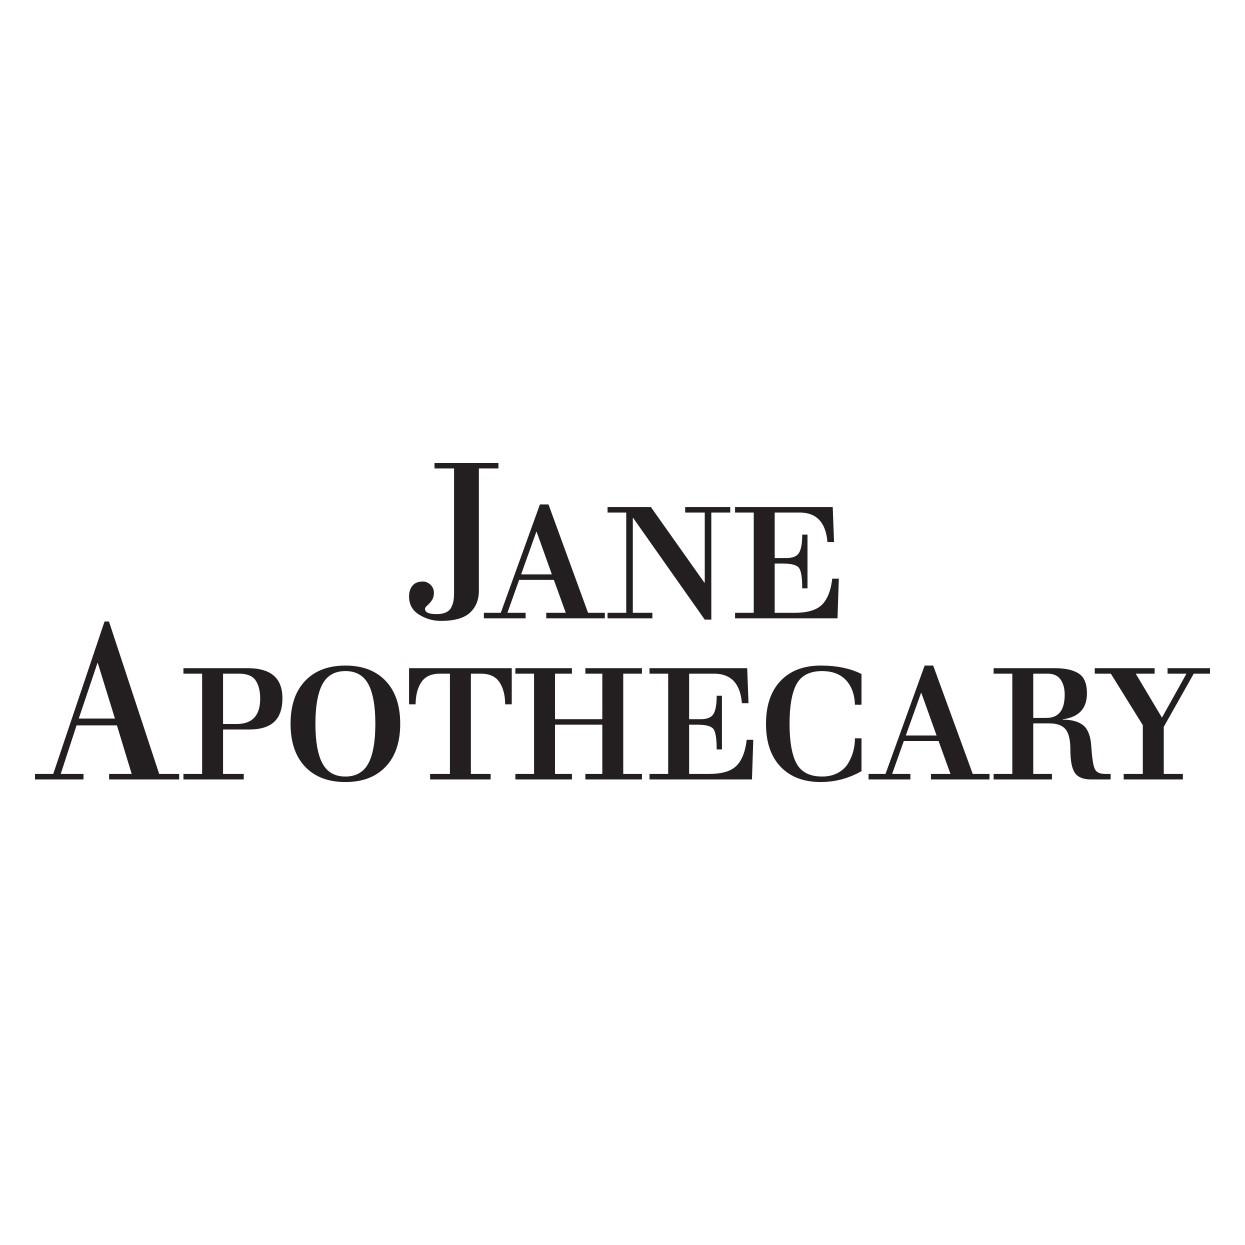 JANE APOTHECARY